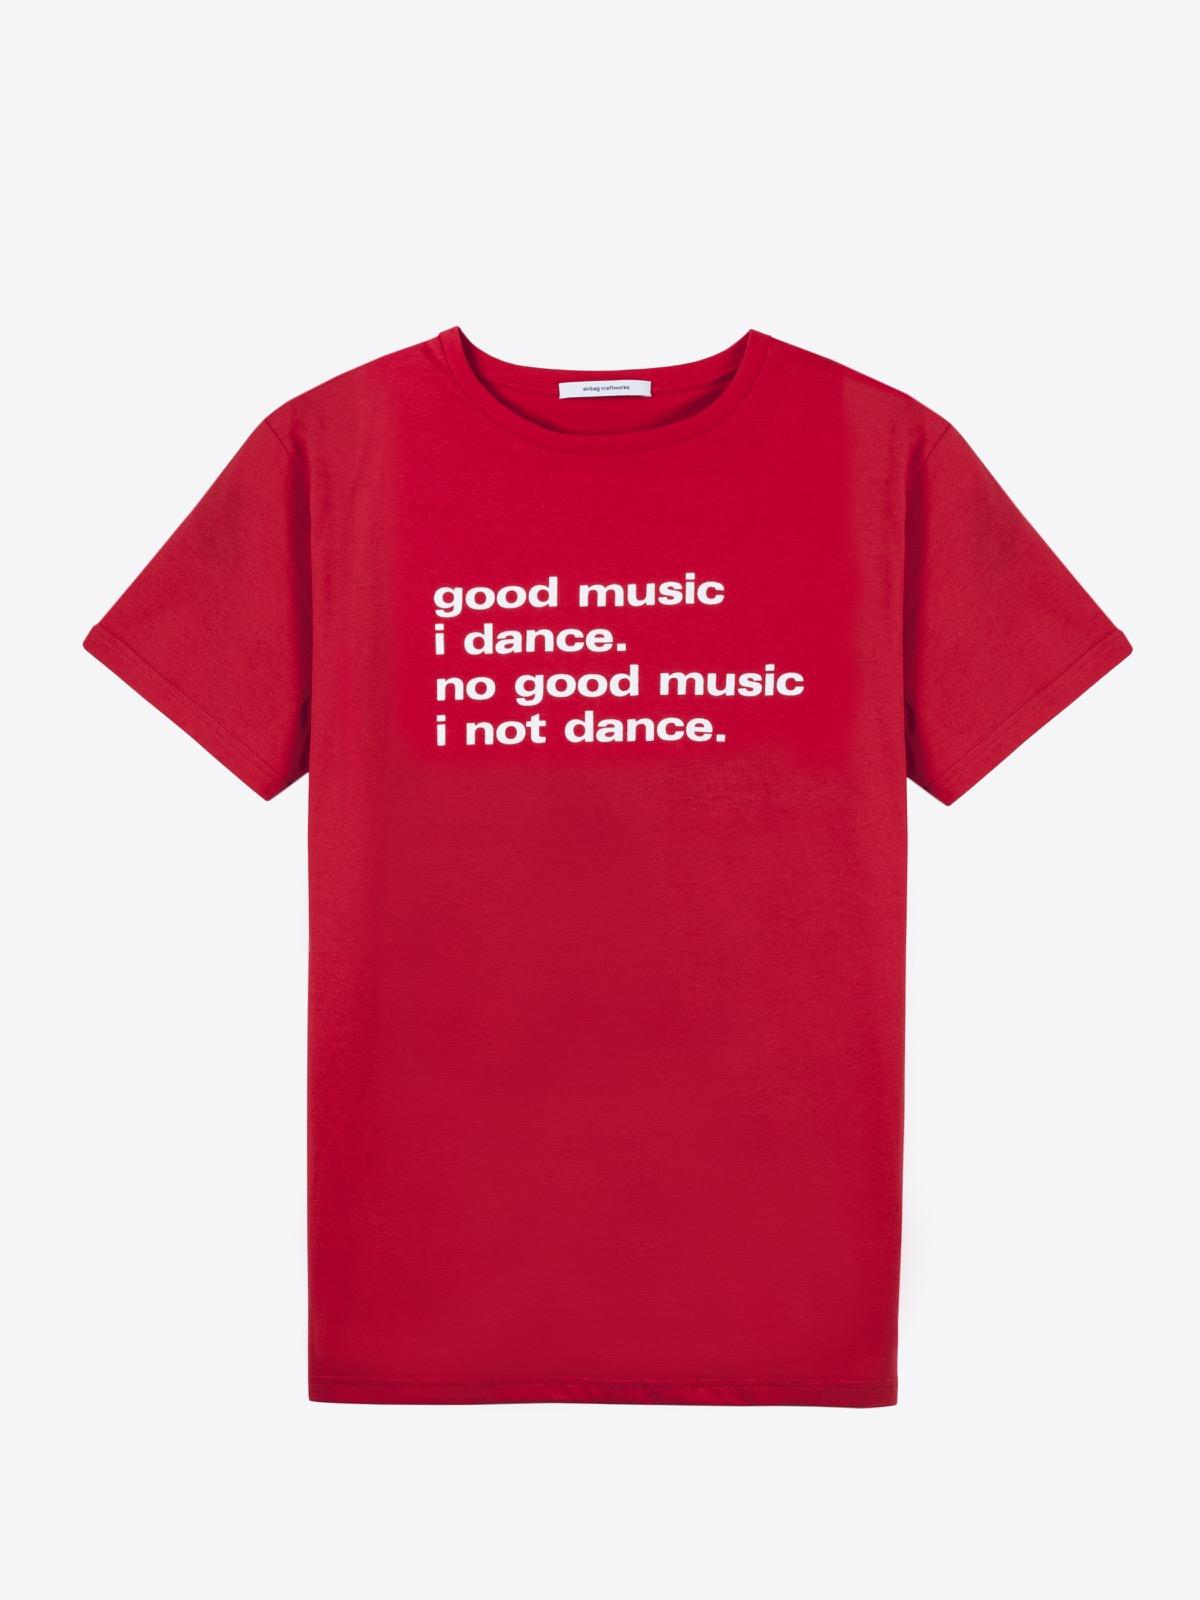 airbag craftworks good music i dance | red